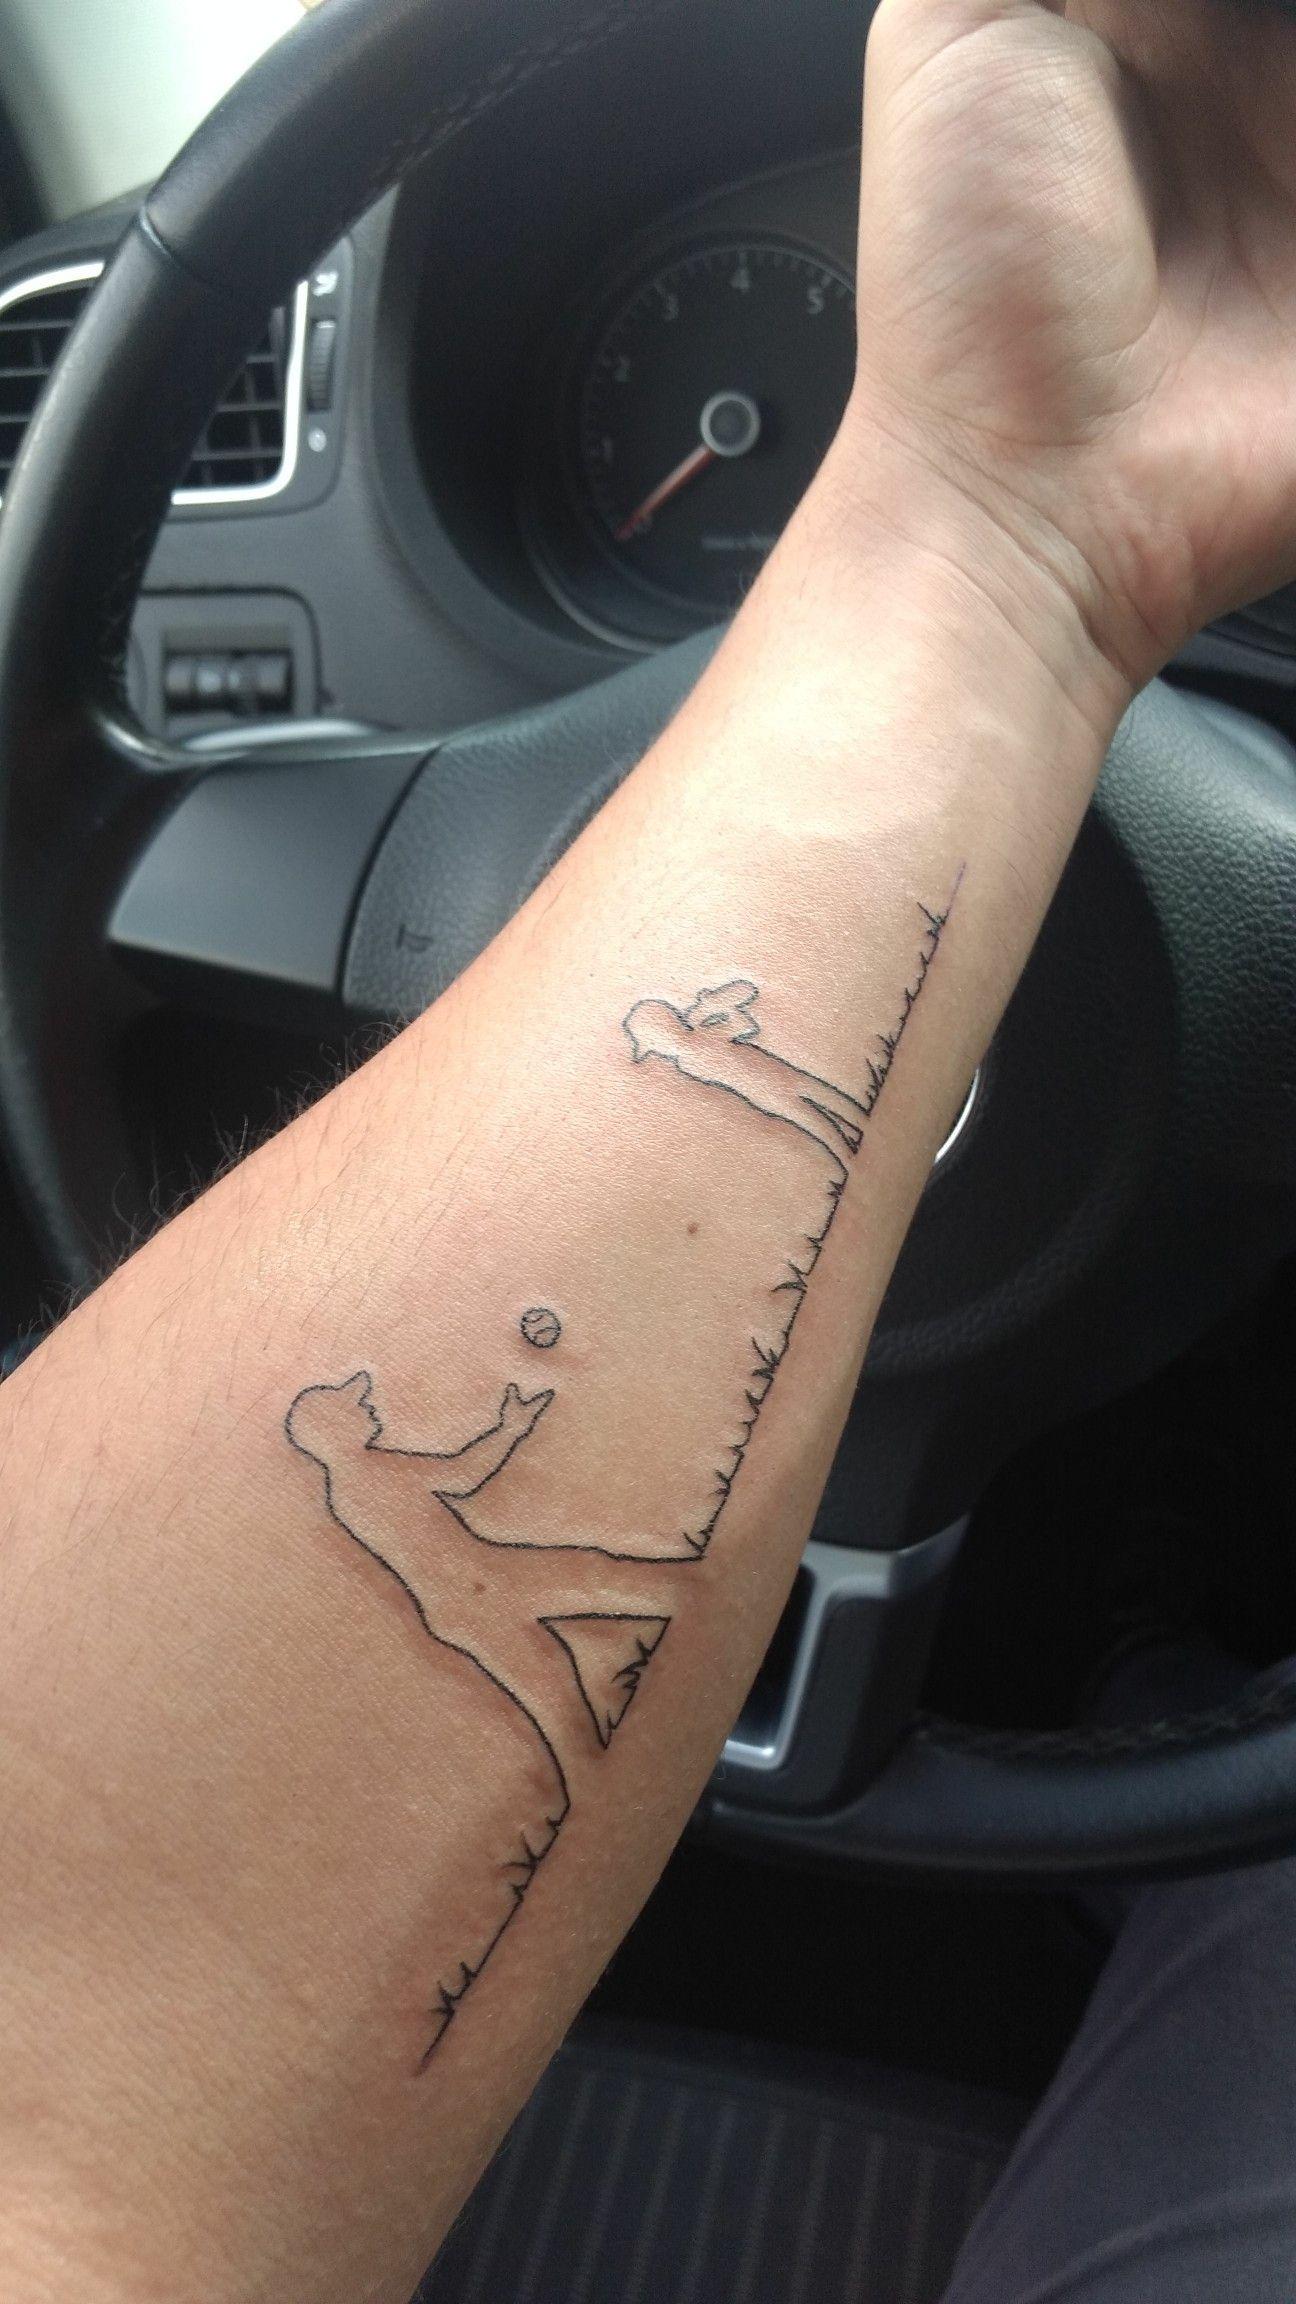 Tatoo Beisbol Padrino Tatuajes De Beisbol Tatuajes Mangas Tatuajes